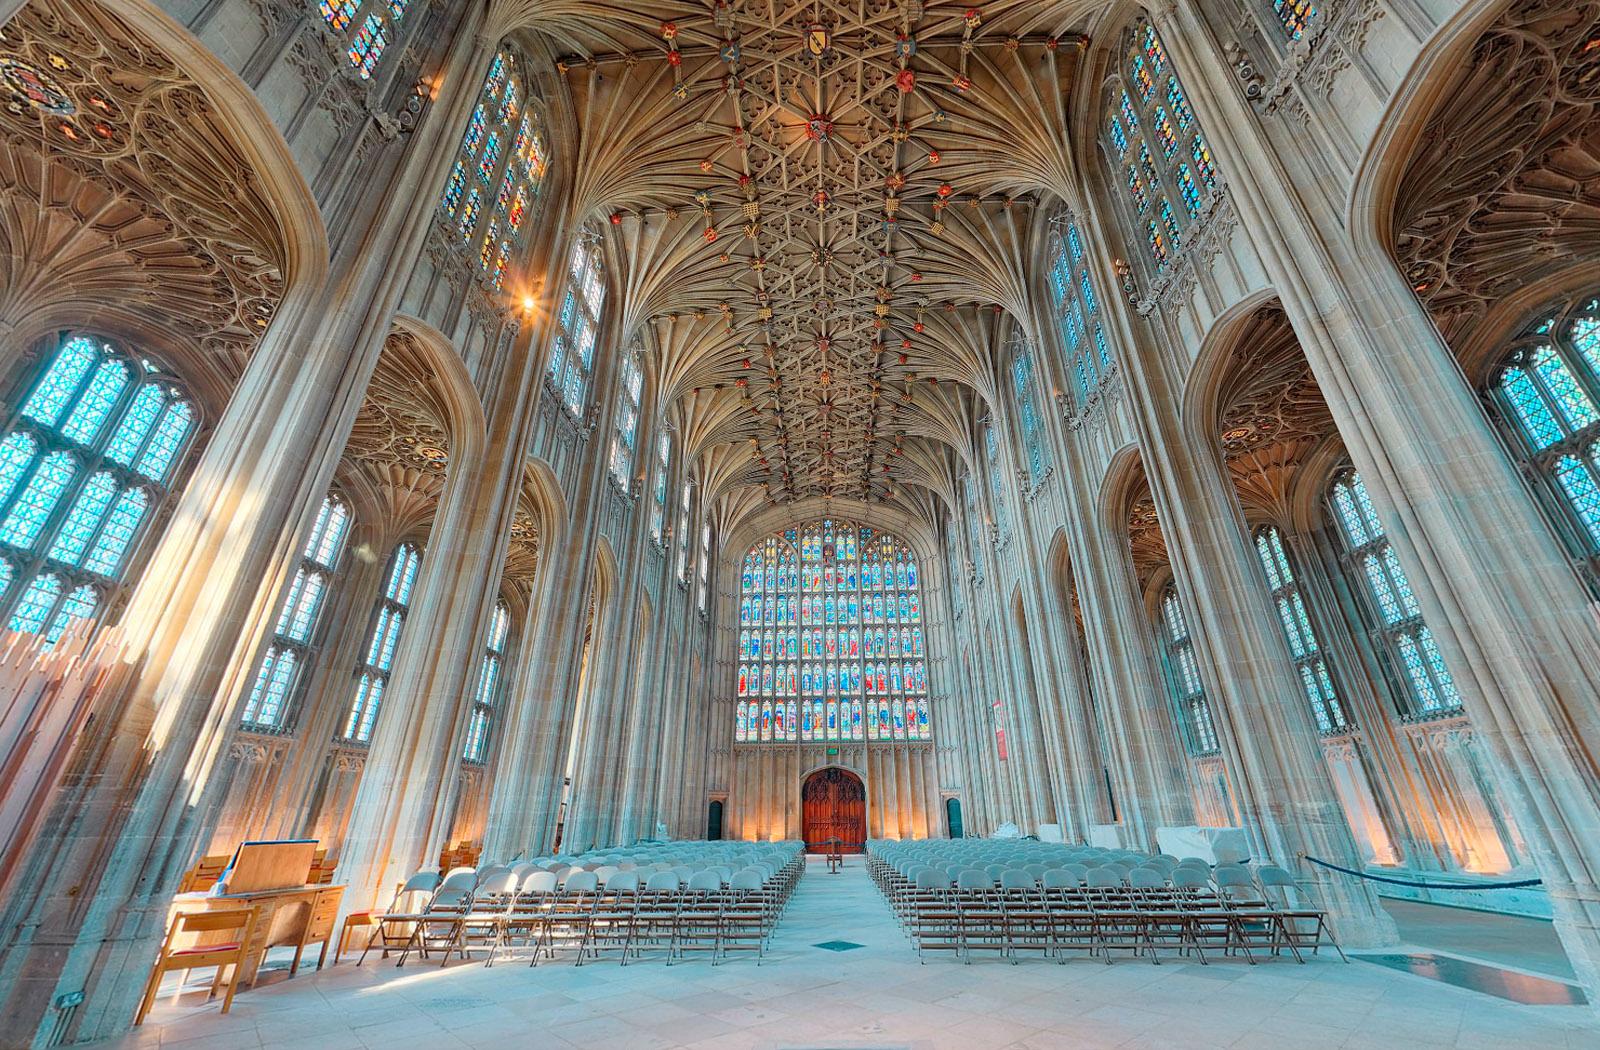 Virtual Tours of St George's Chapel Windsor Castle